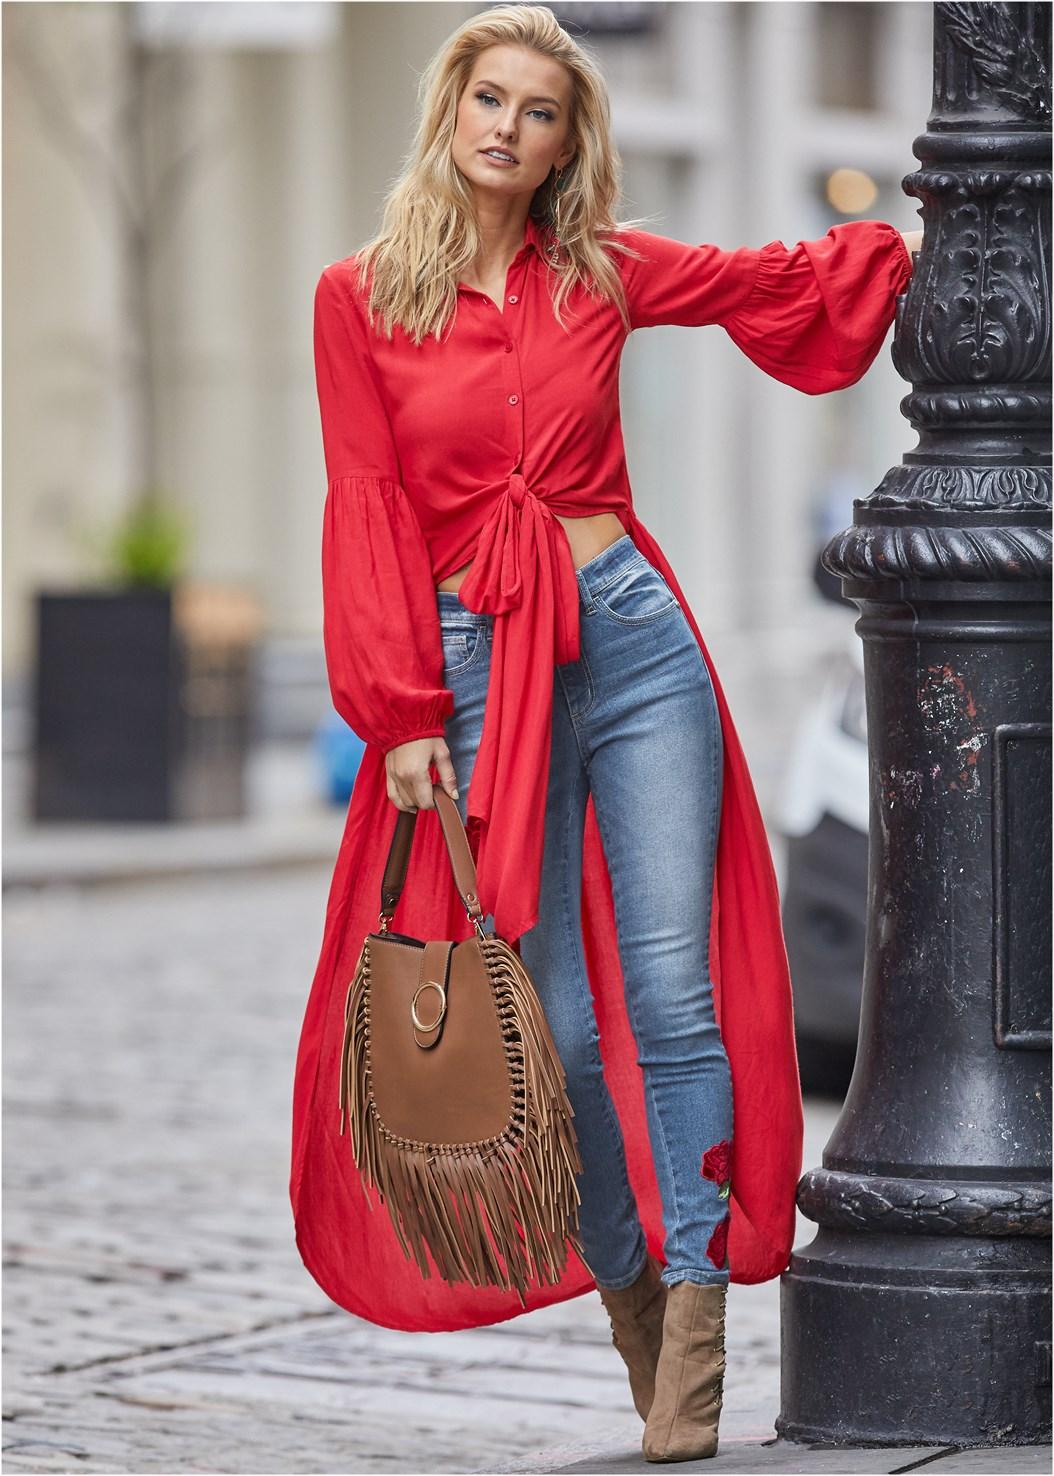 Tie Front High Low Top,Rose Embroidered Jeans,Cage Contour Bra,Embellished Lucite Heel,Fringe Handbag,Twist Hoop Earring